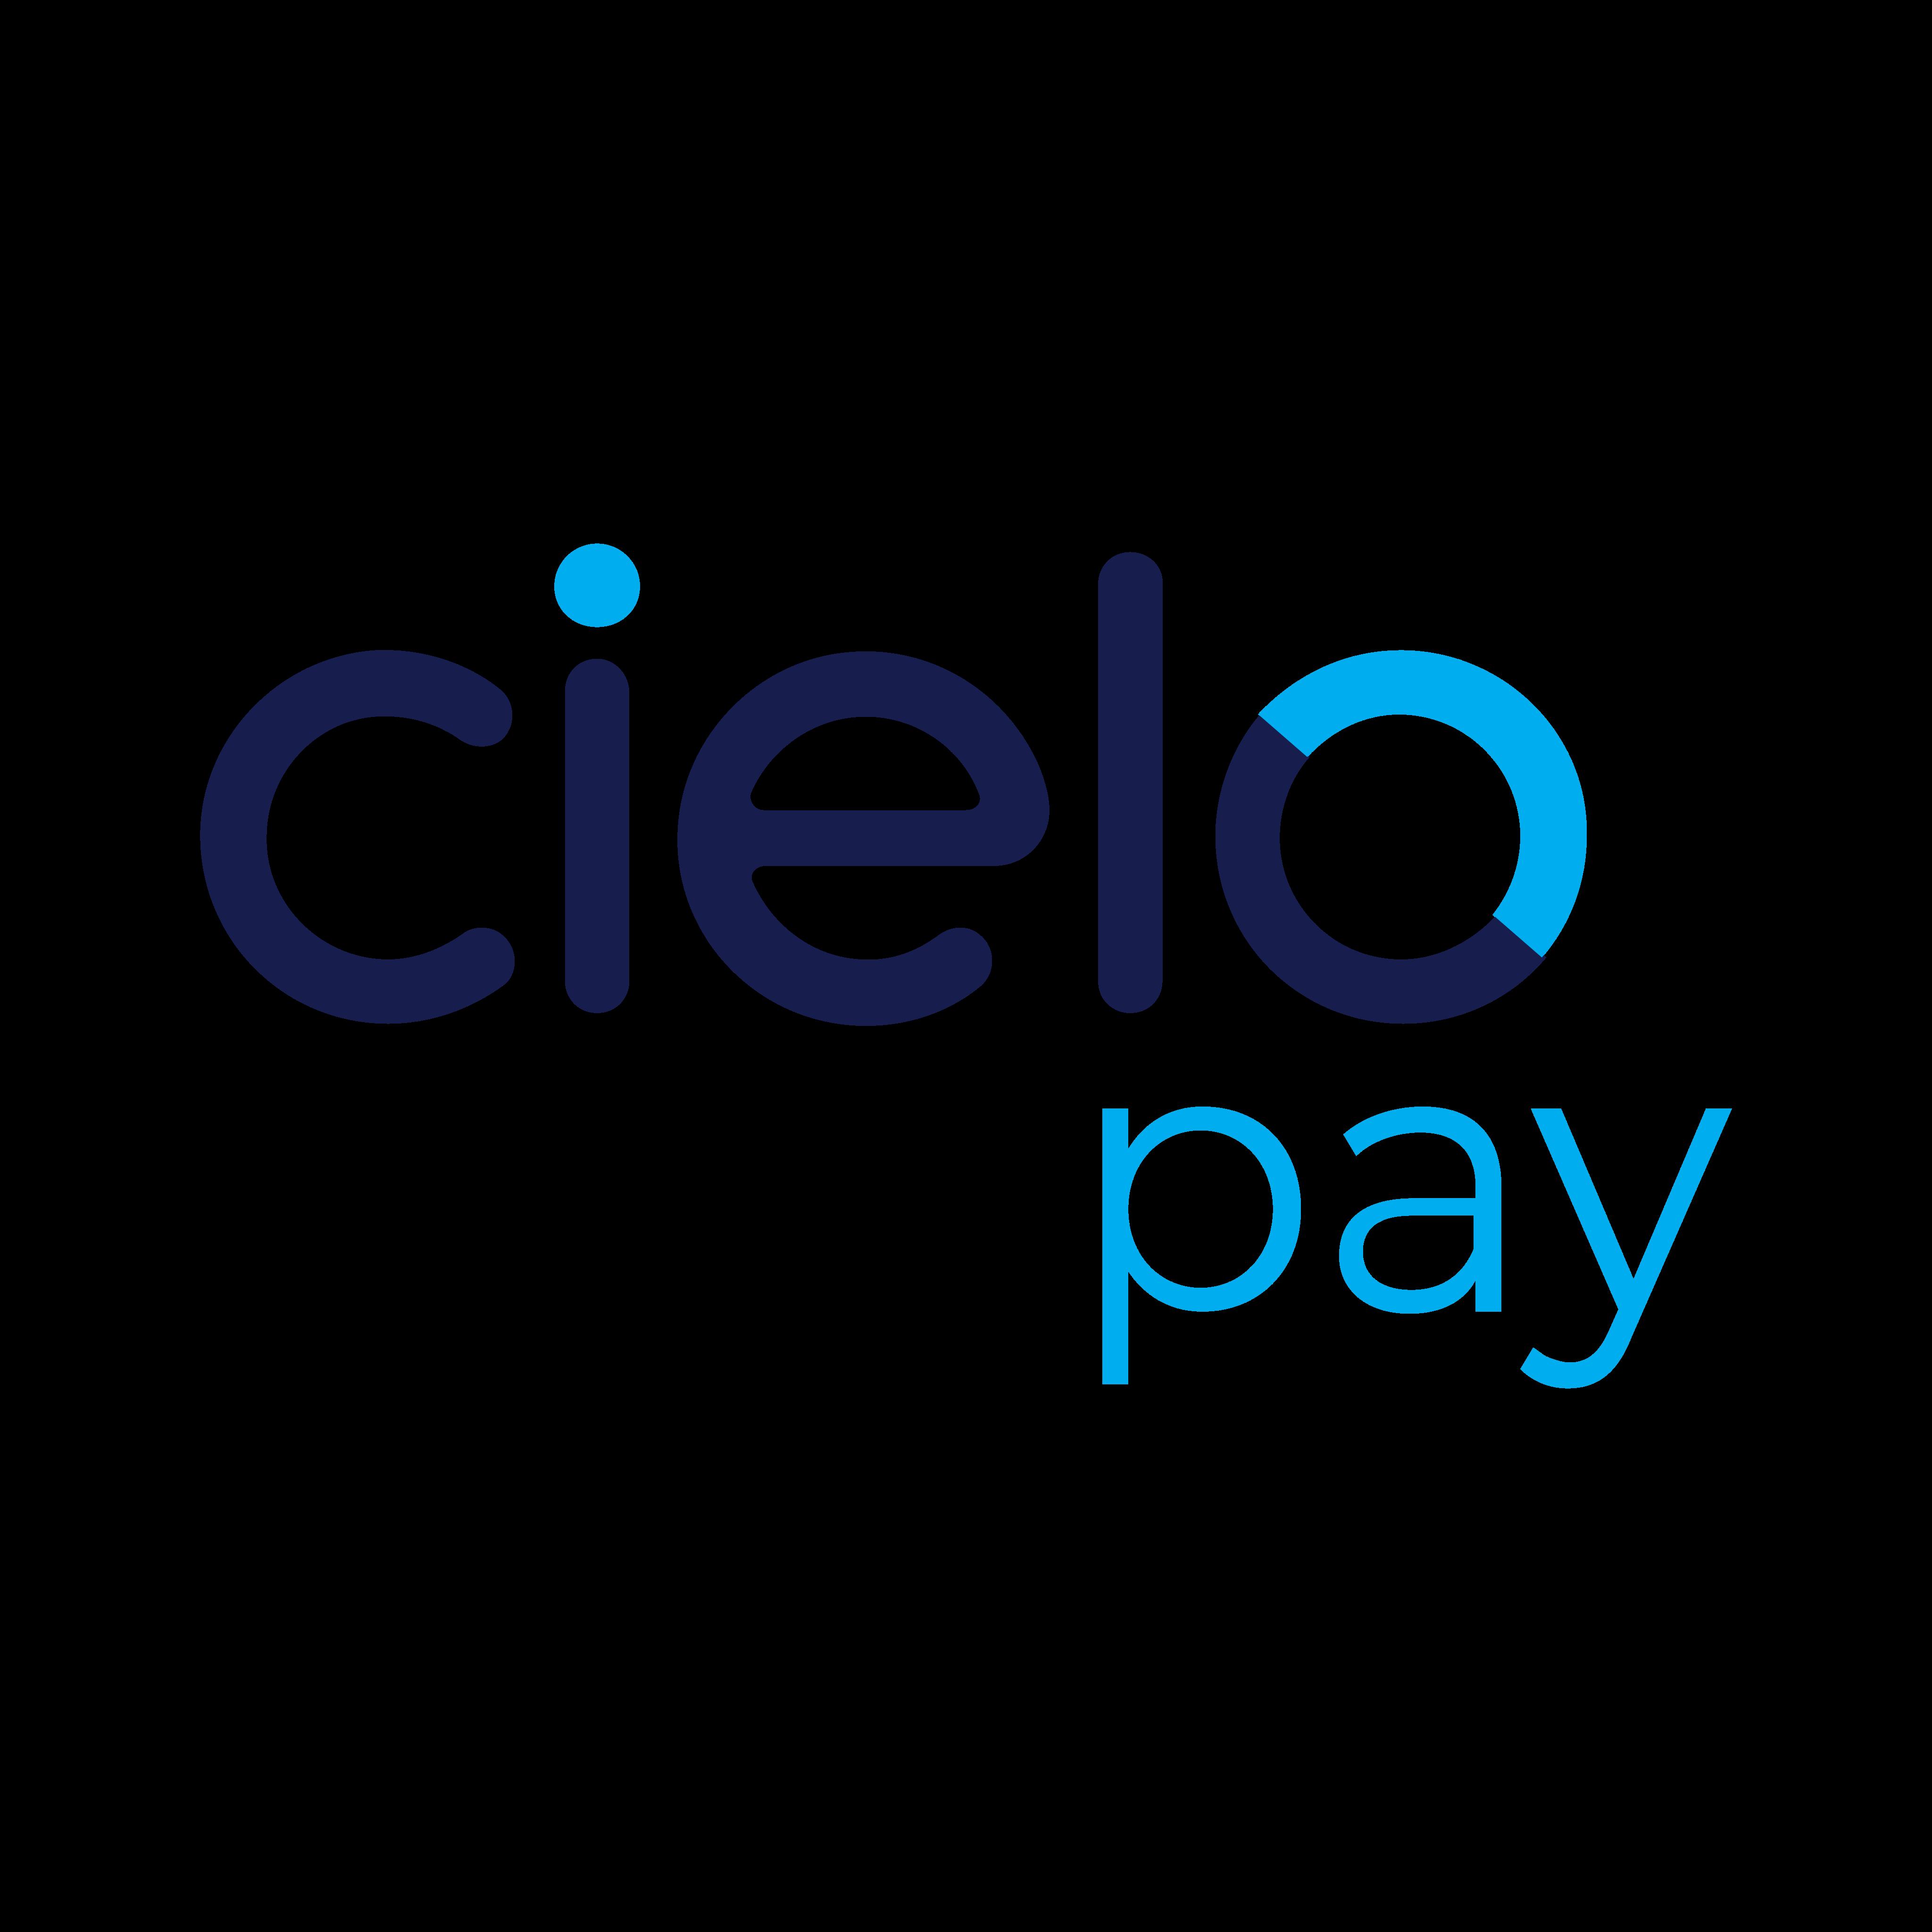 cielo pay logo 0 - Cielo Pay Logo